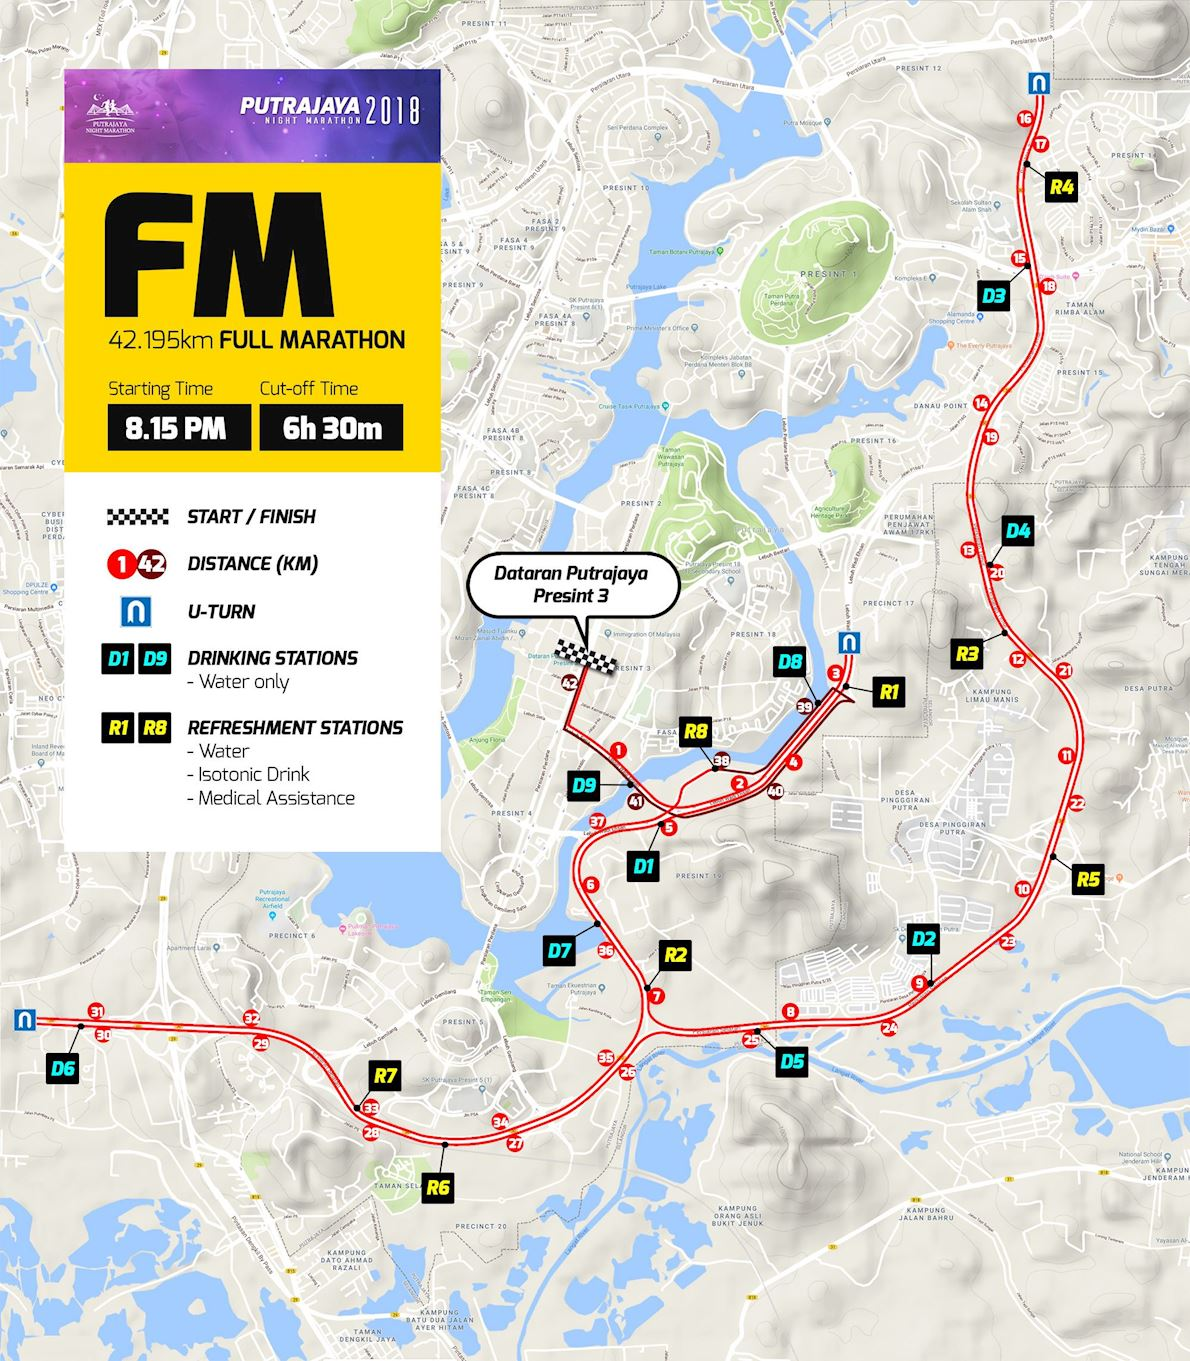 Putrajaya Night Marathon Routenkarte